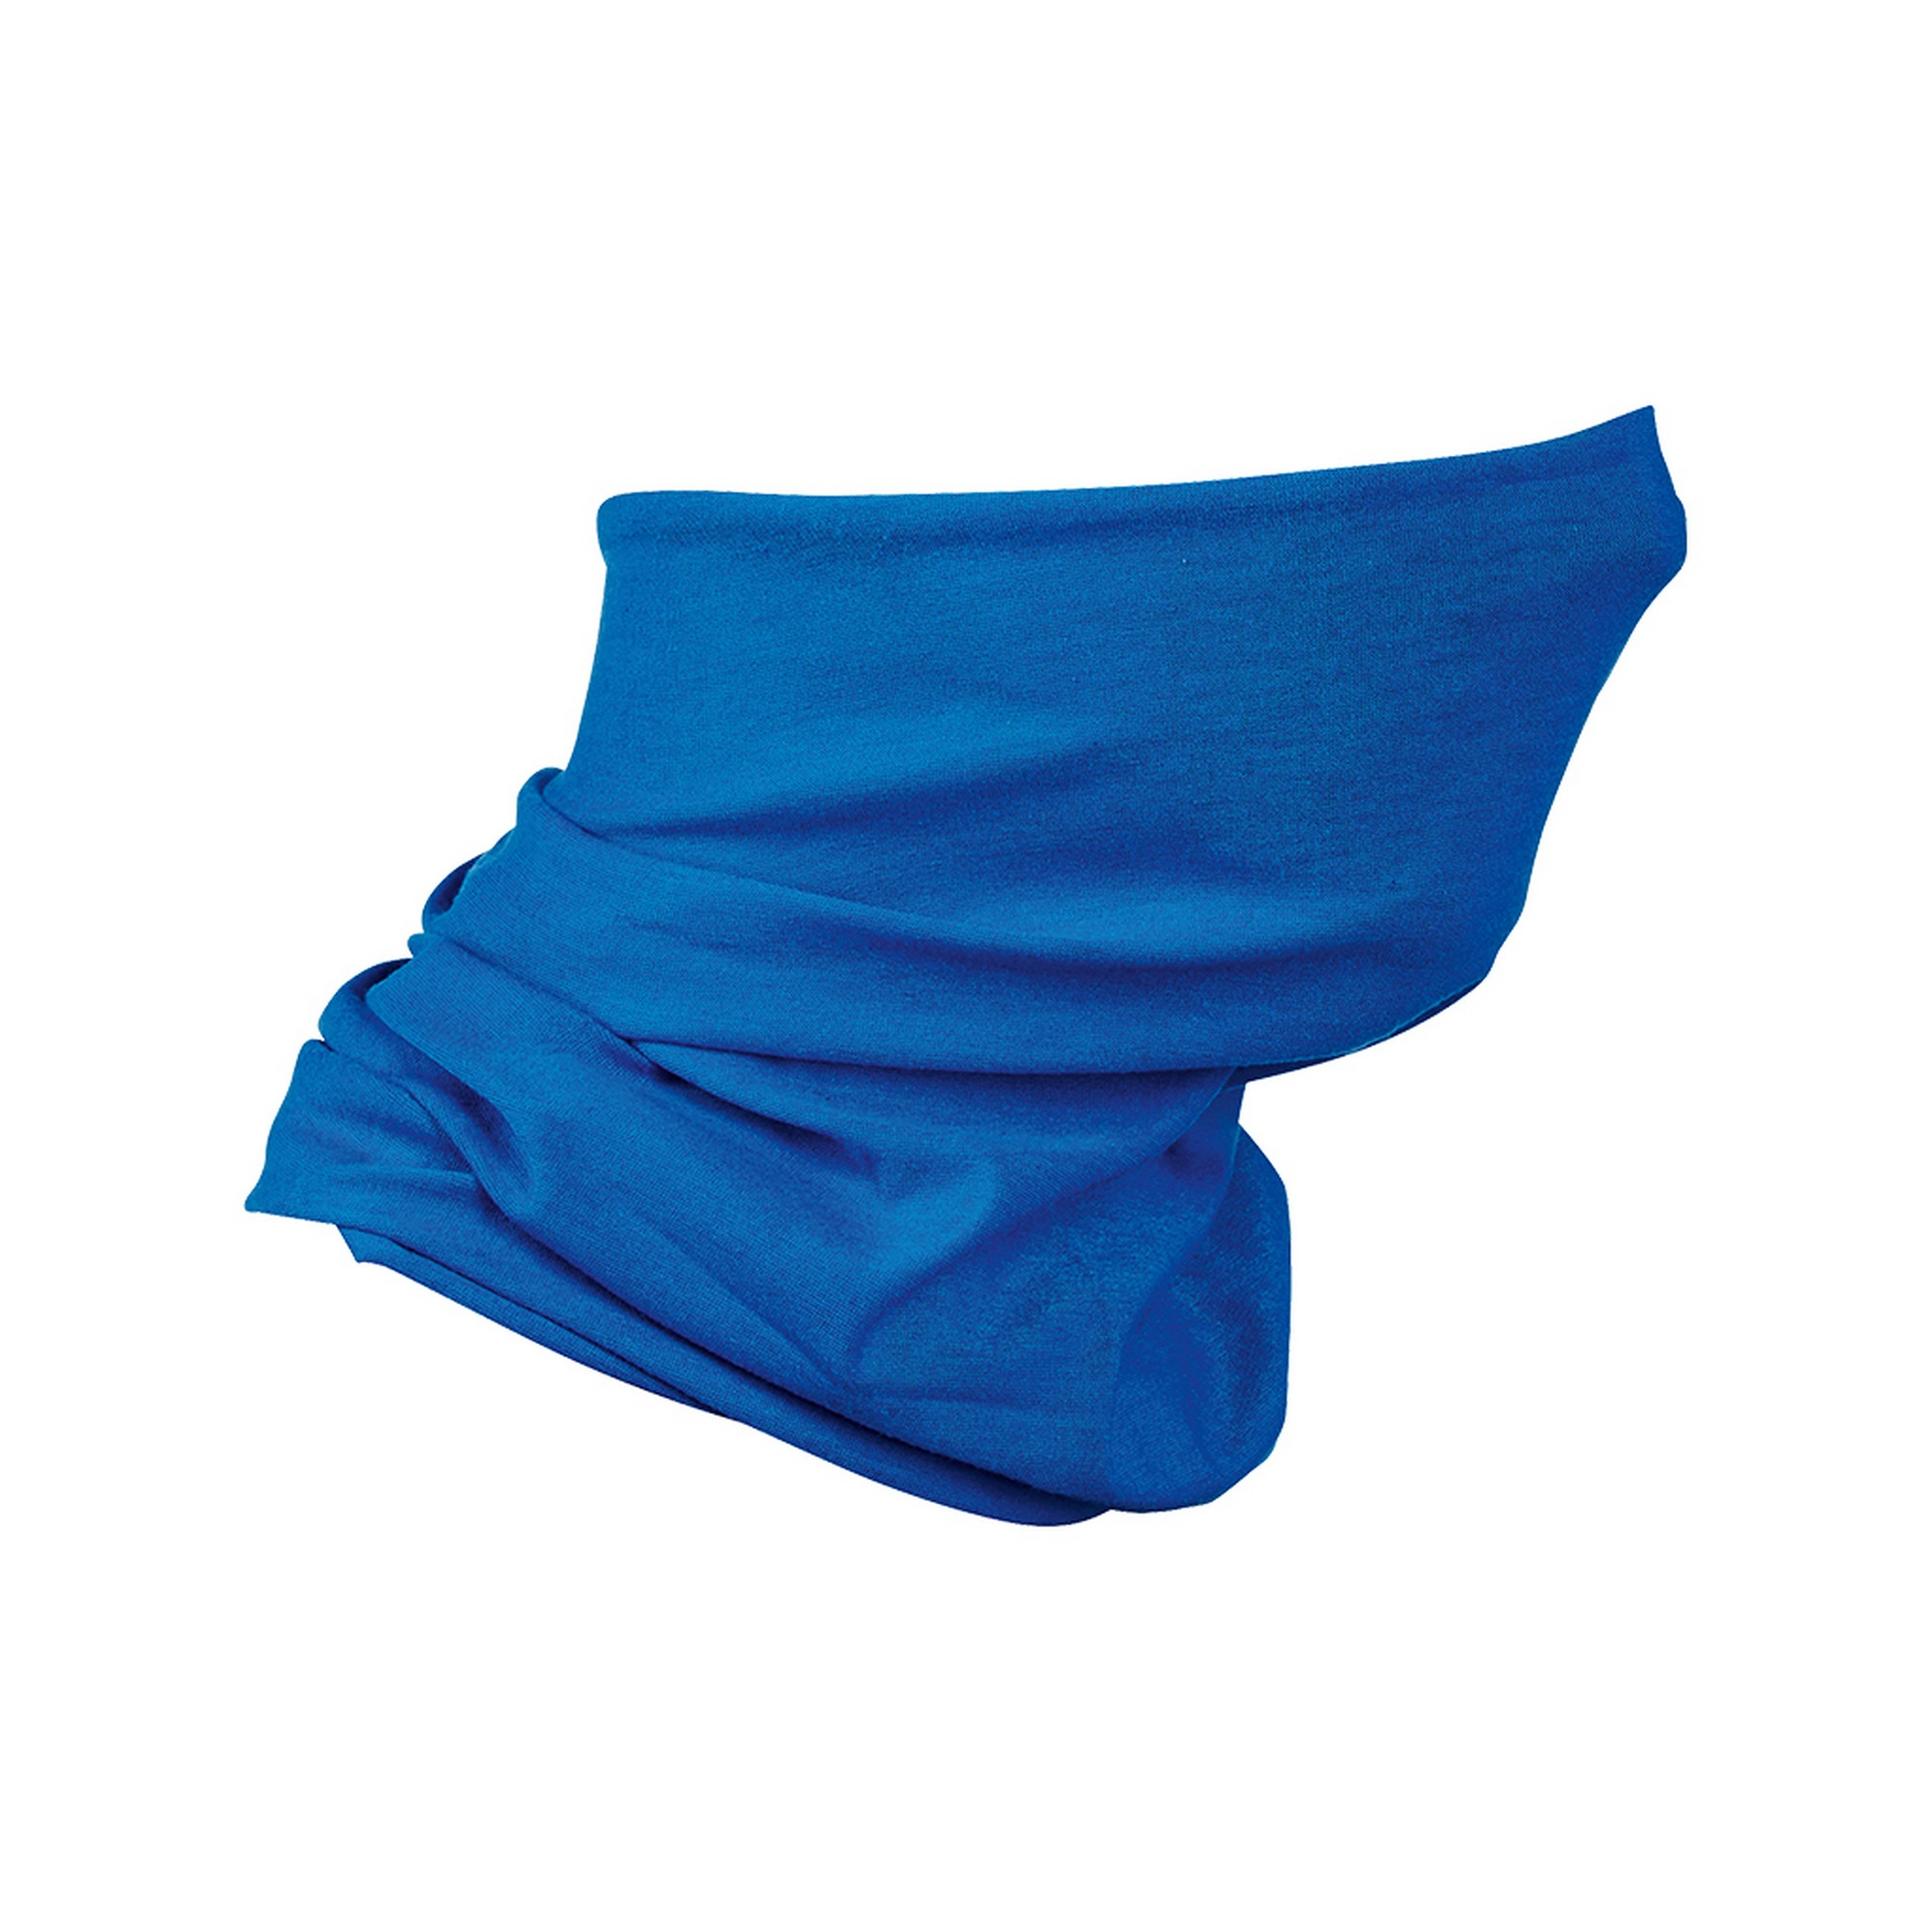 SOLS Unisex Adults Bolt Neck Warmer (One Size) (Royal Blue)